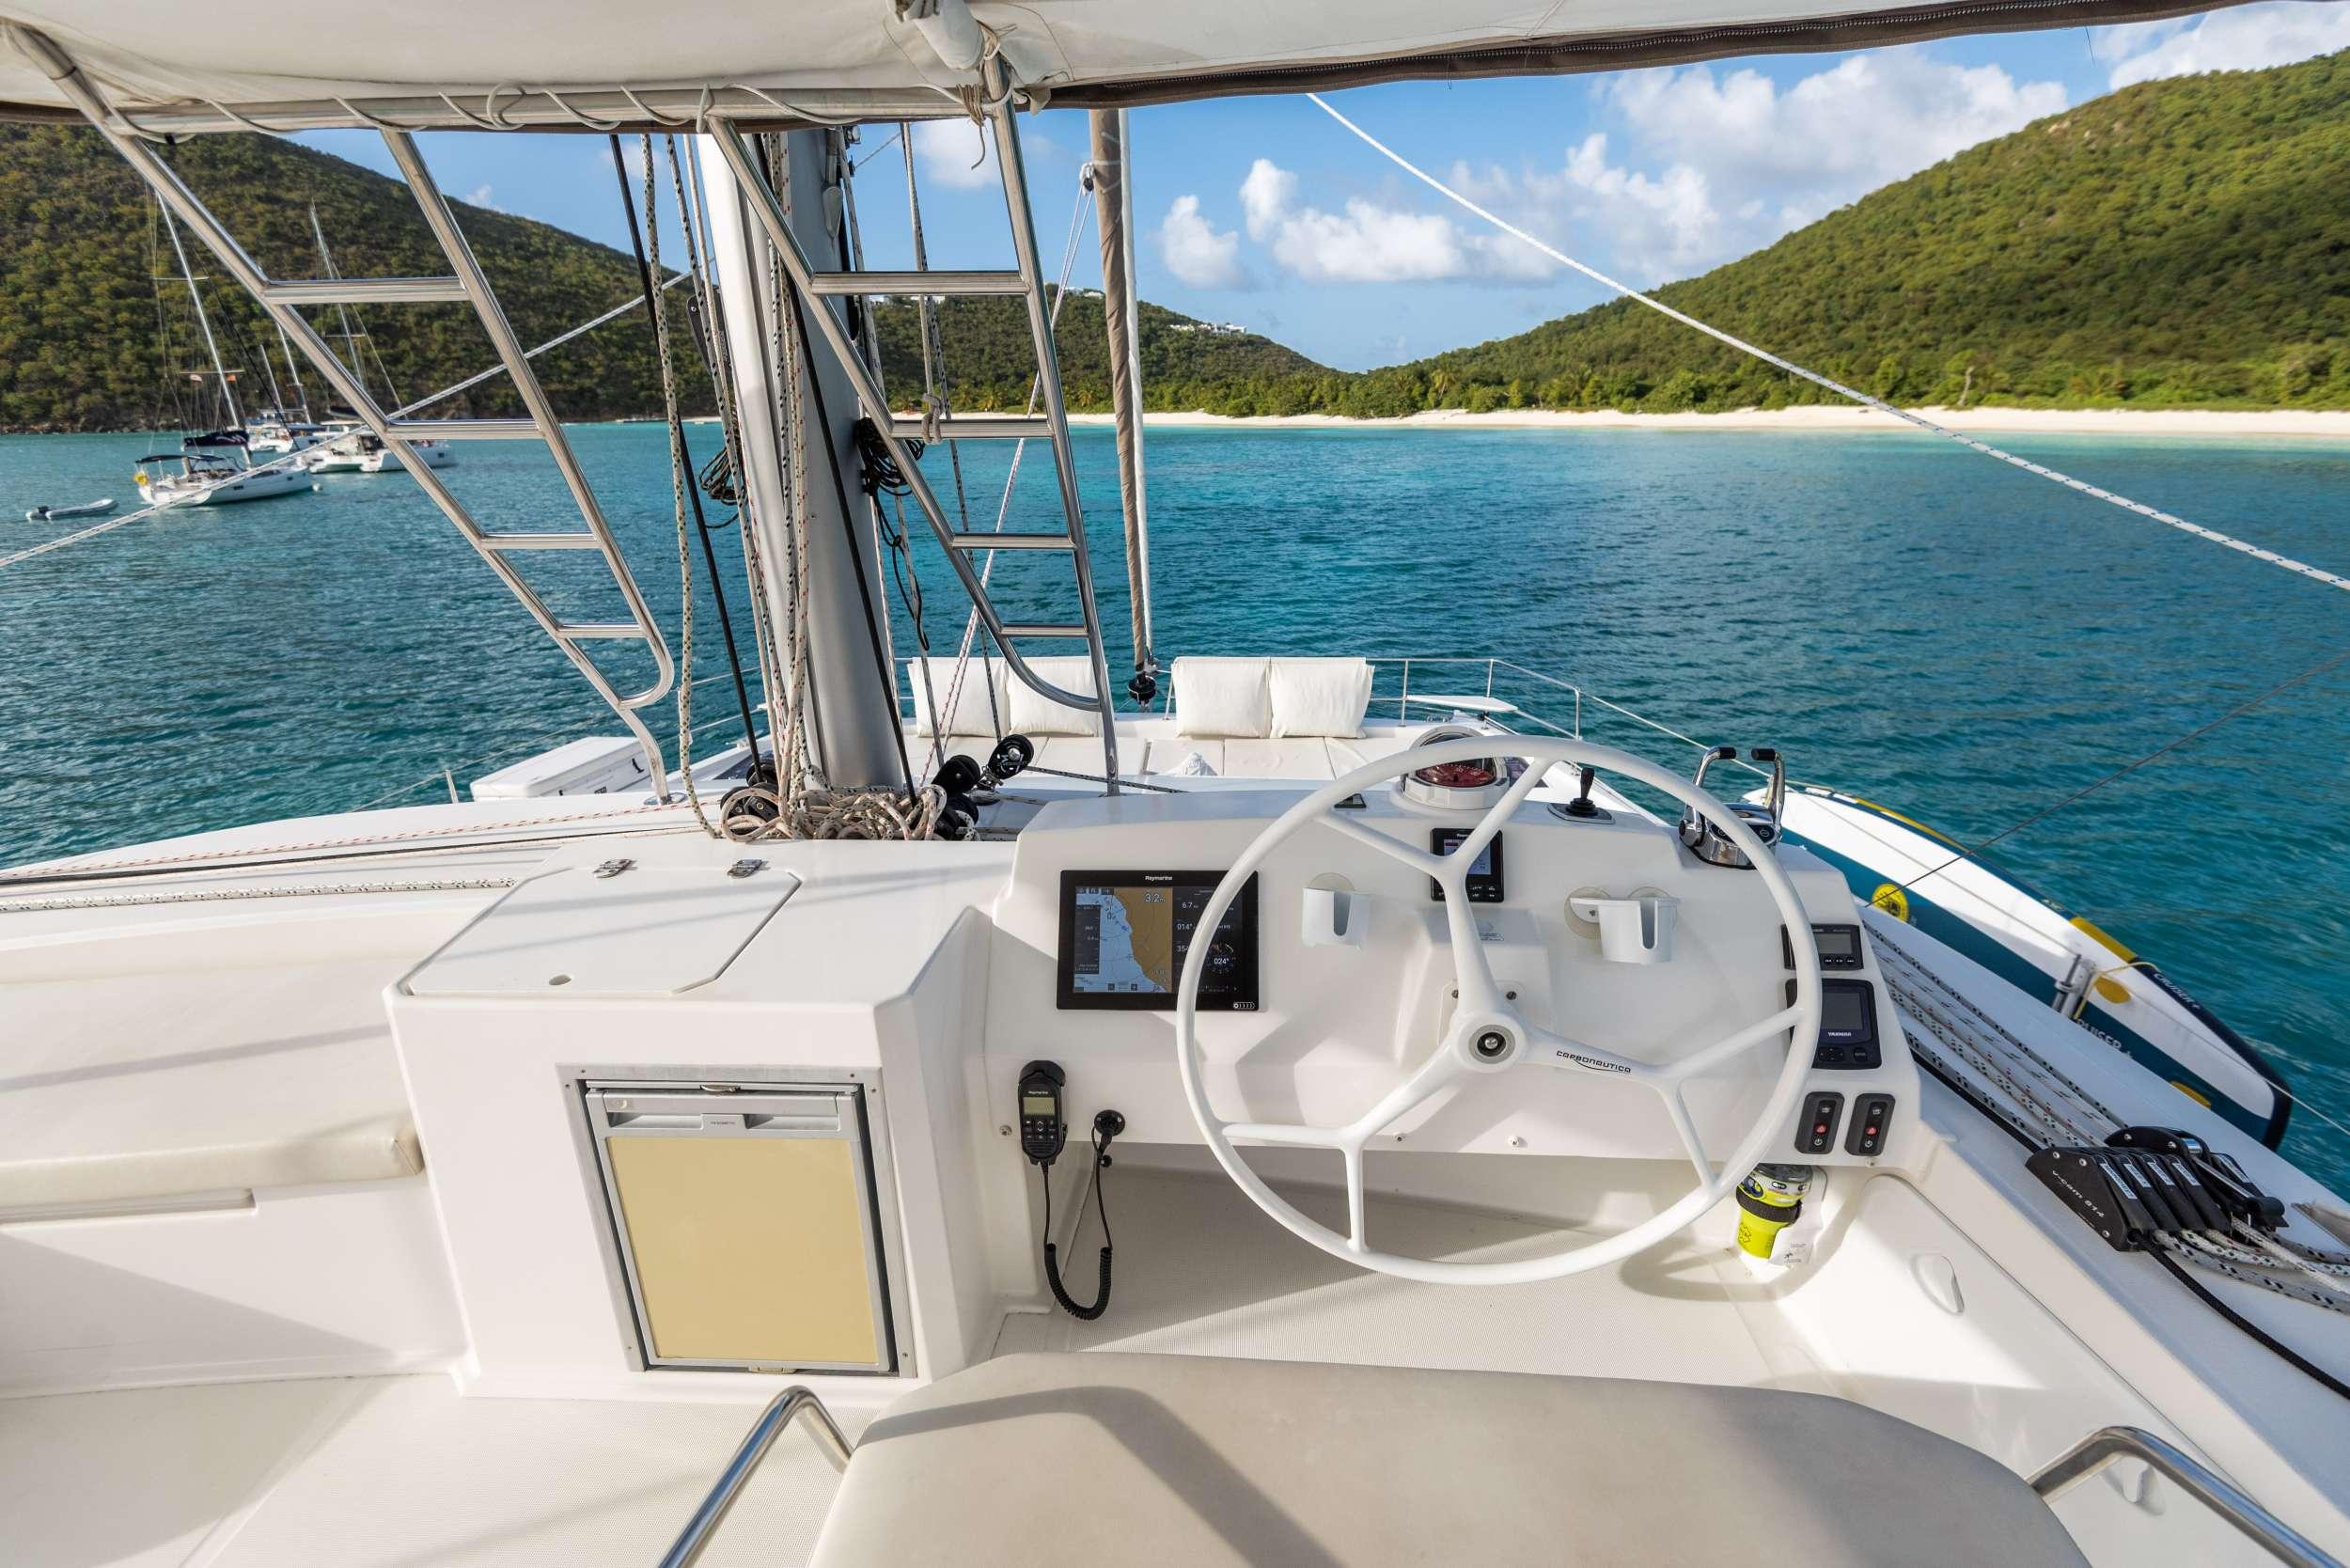 Ad Astra Yacht Vacation